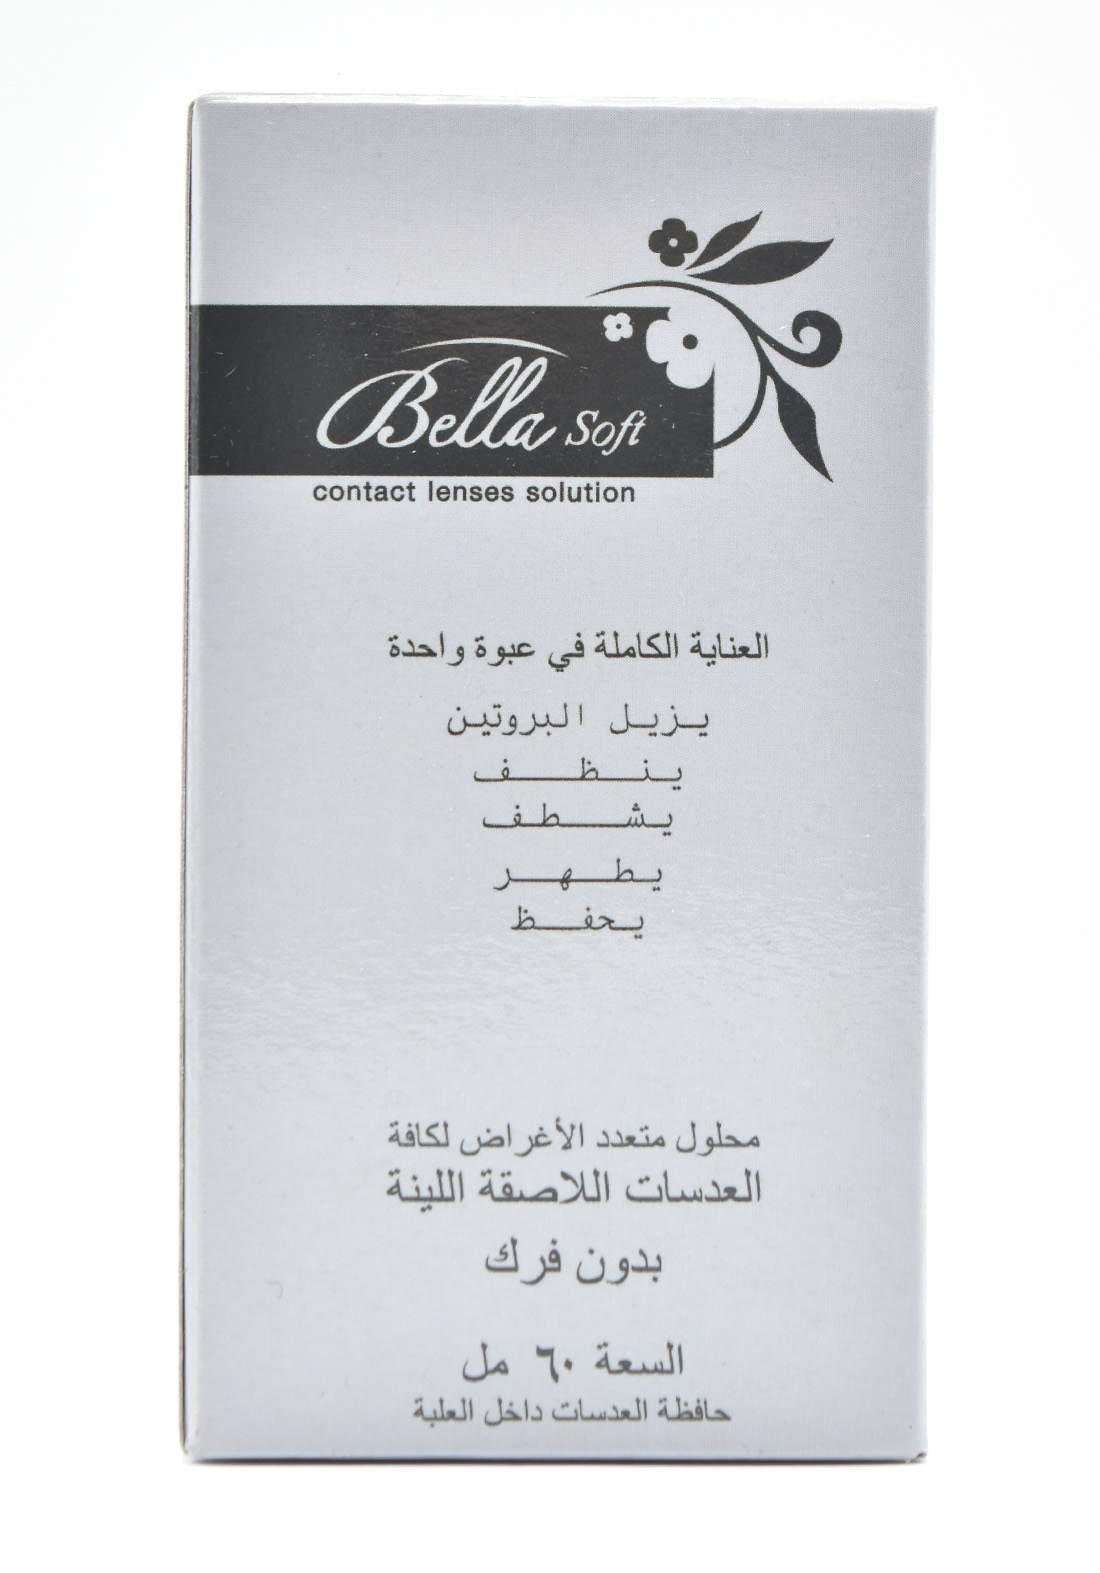 Bella Soft 30402 Korean Contact Lens Solution 60ml سائل للعدسات